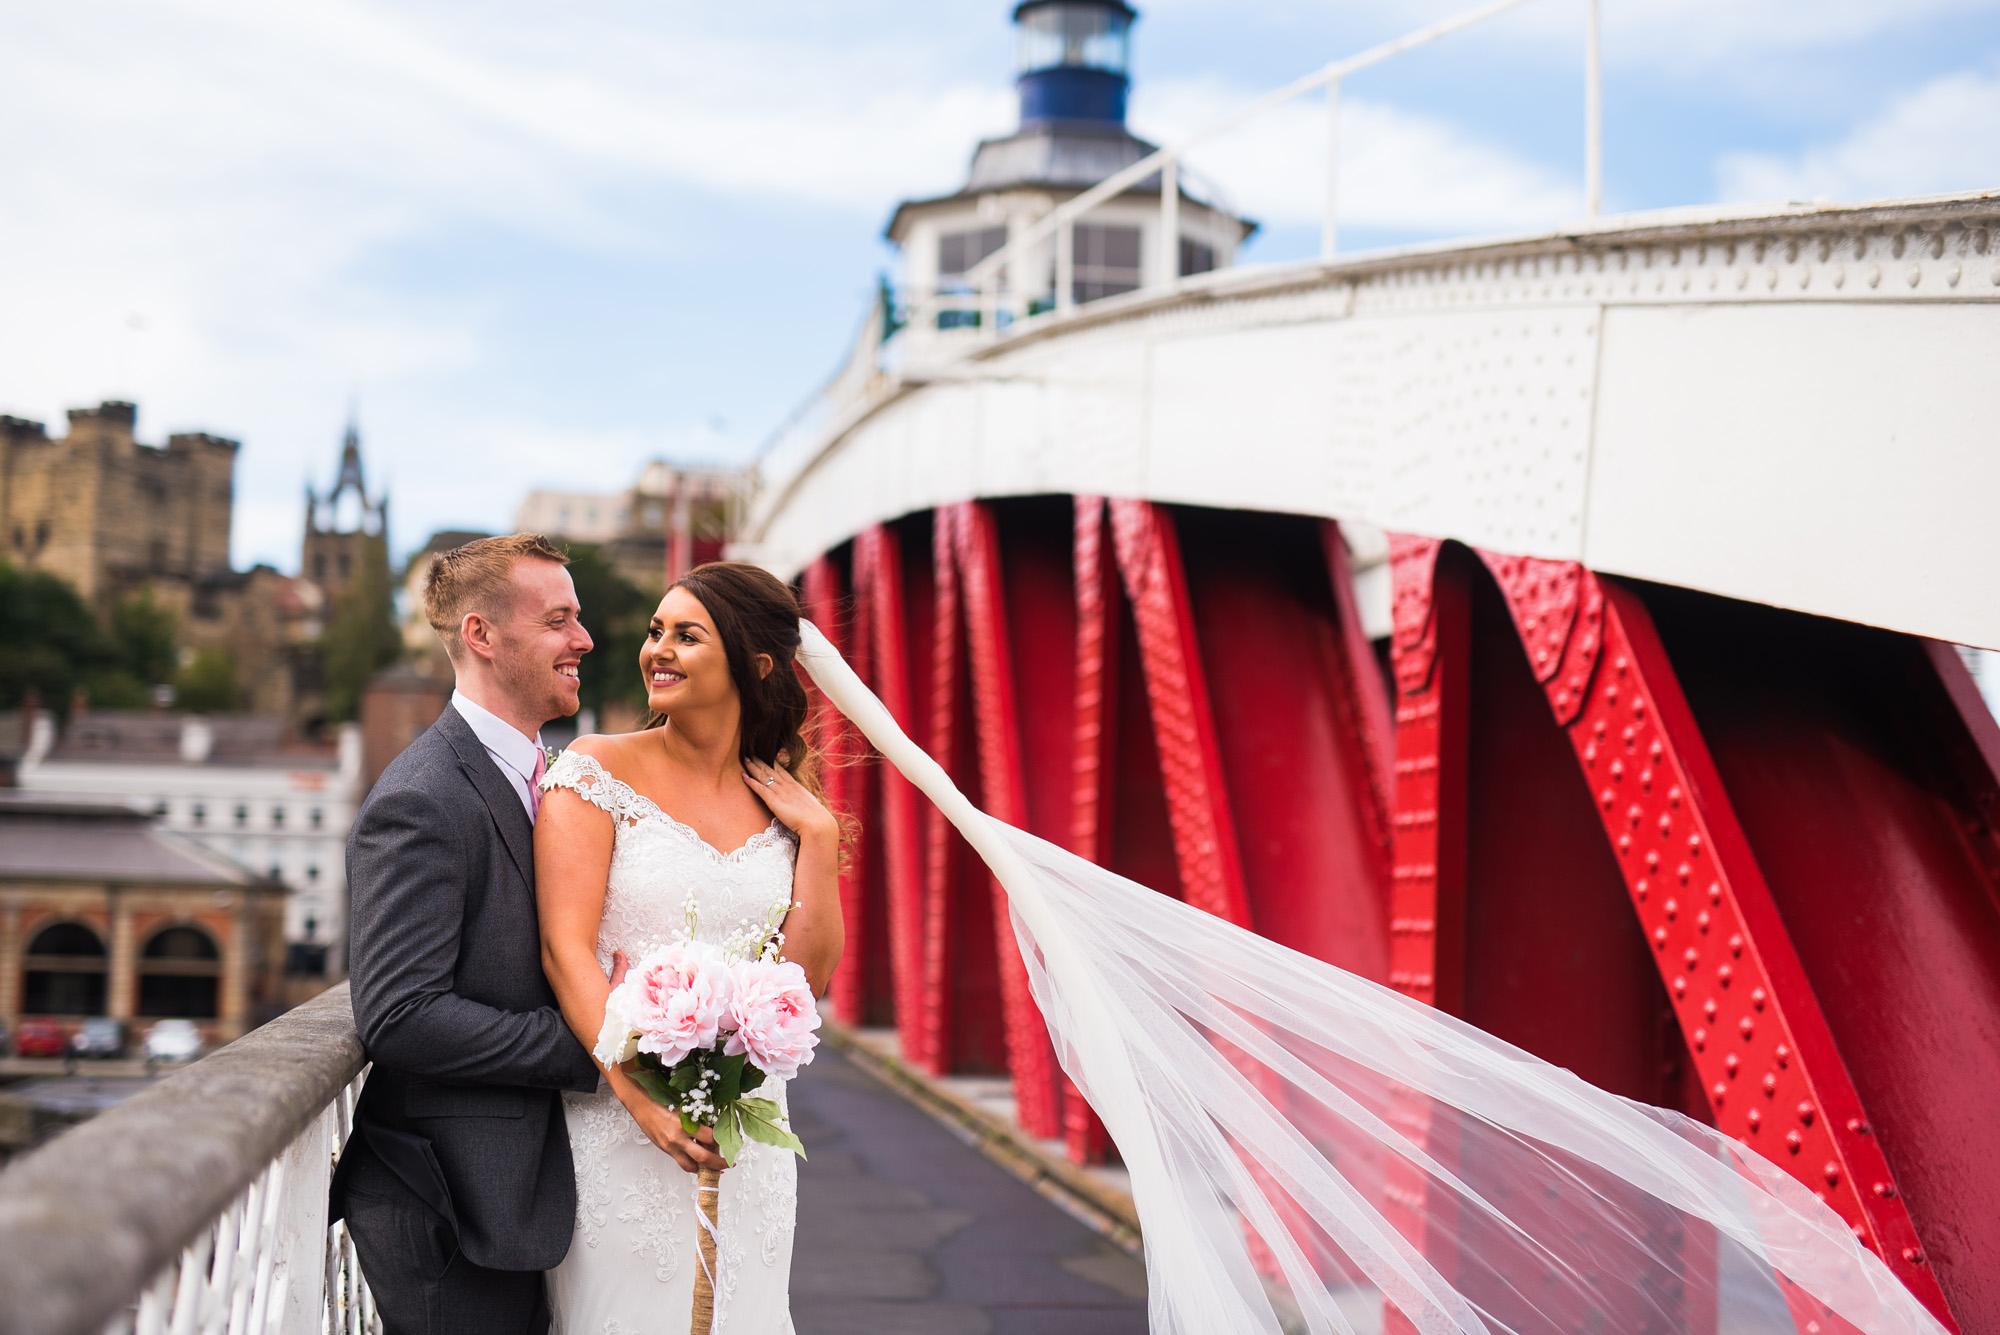 jade and phillip wedding photos (81 of 100).jpg